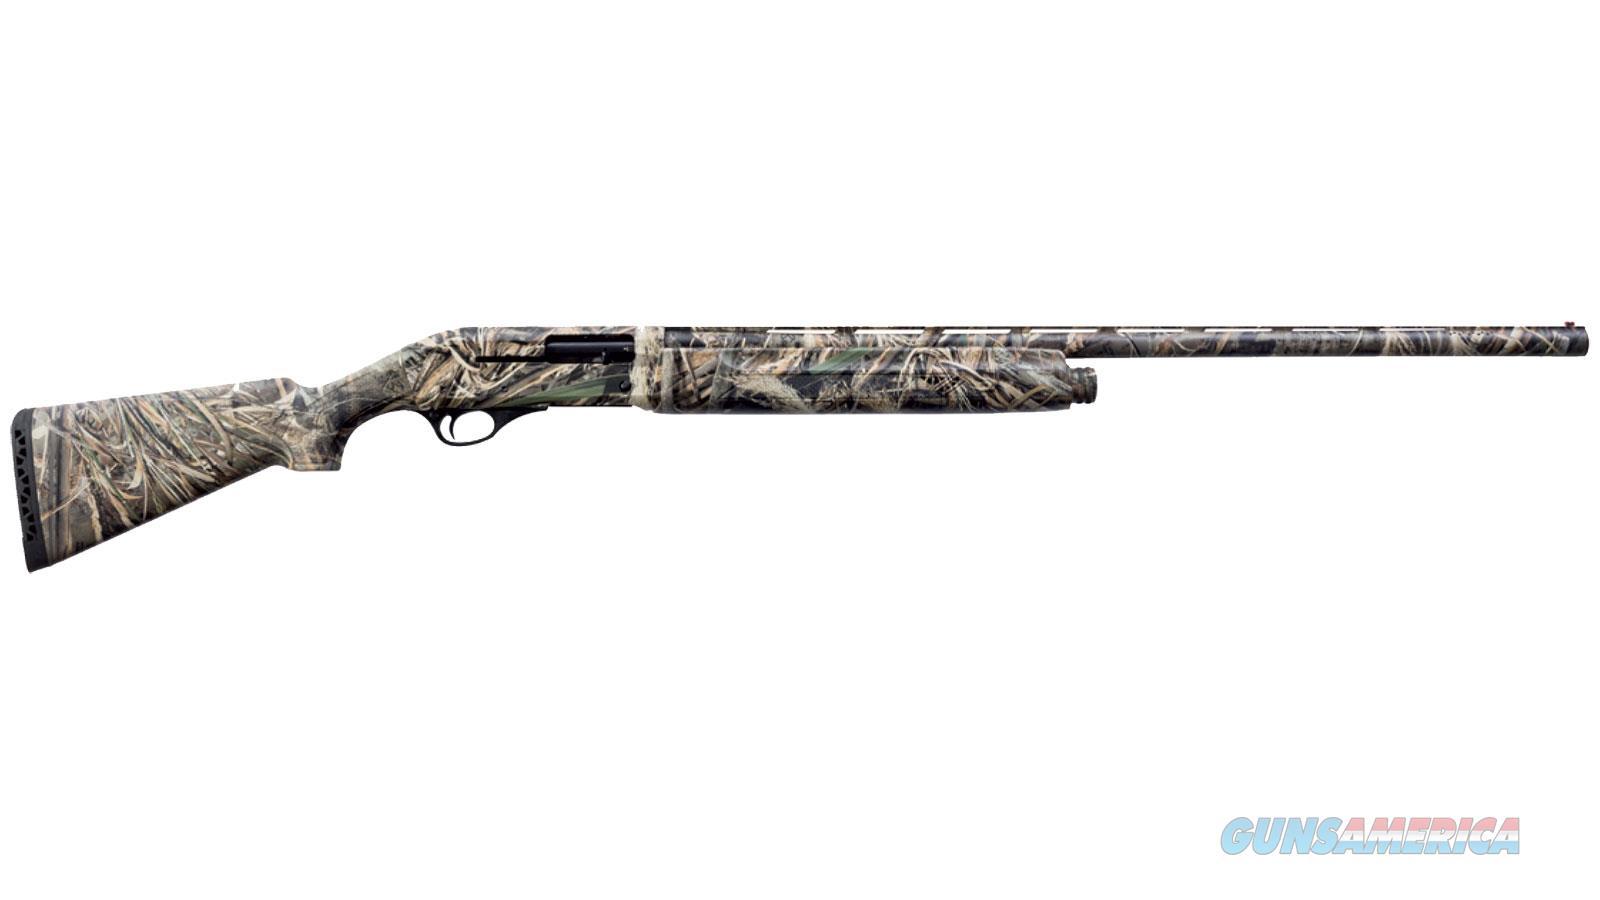 "Chiappa Firearmsmks 635 Semi 12G 28"" 5Rd 930.099  Guns > Shotguns > C Misc Shotguns"